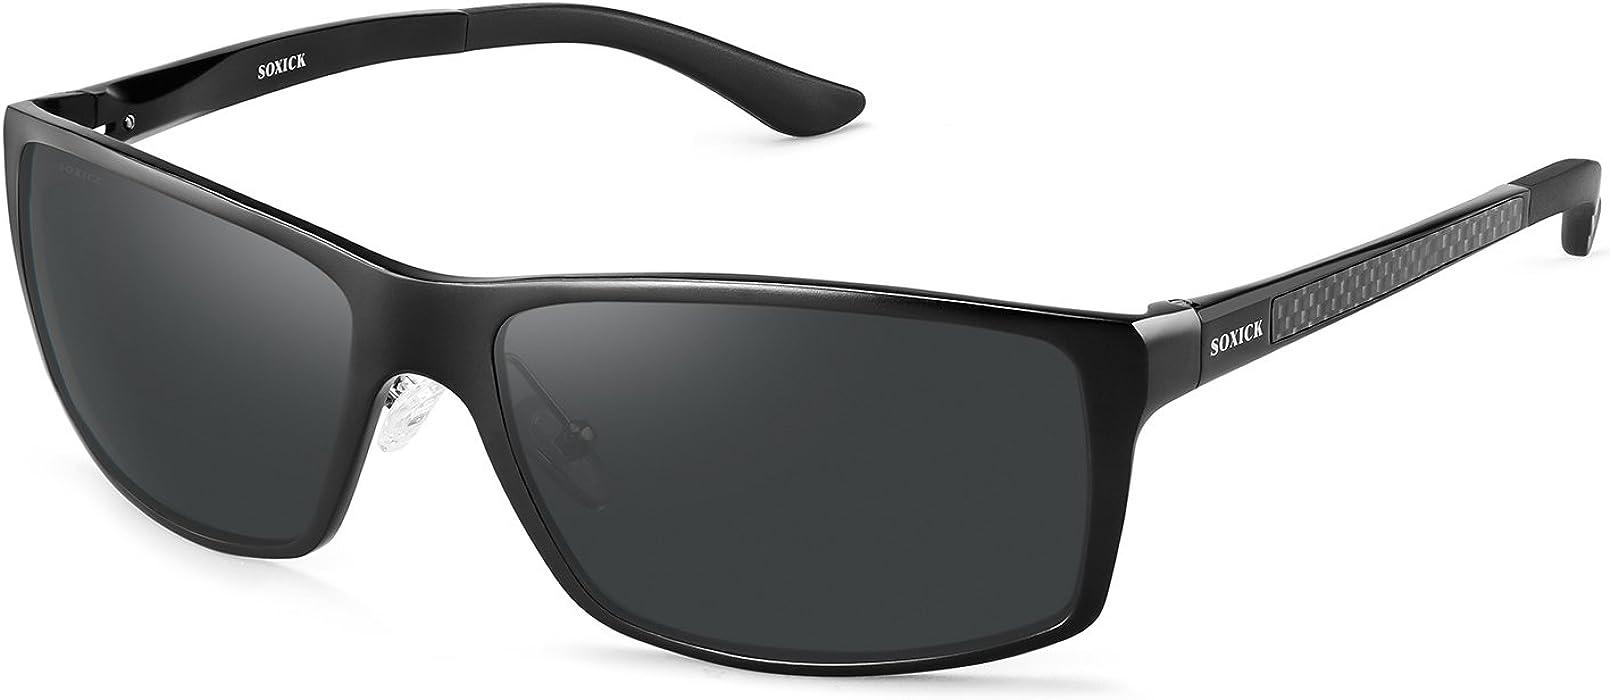 91cf19cc873 SOXICK Polarized Mens Womens Sunglasses